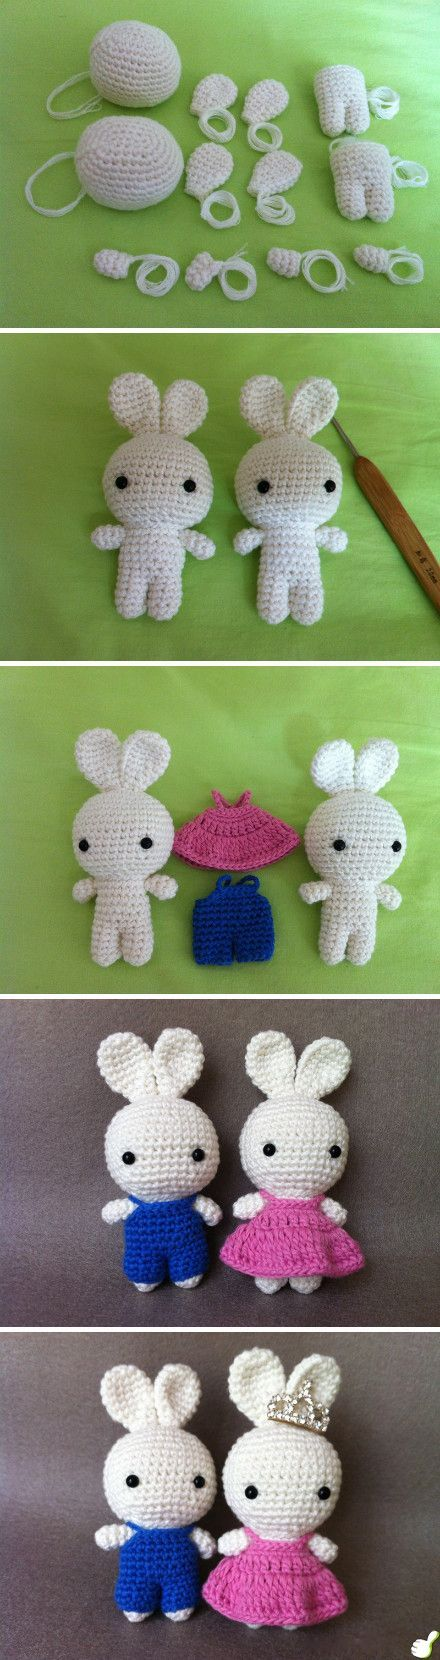 Bunny free pattern: